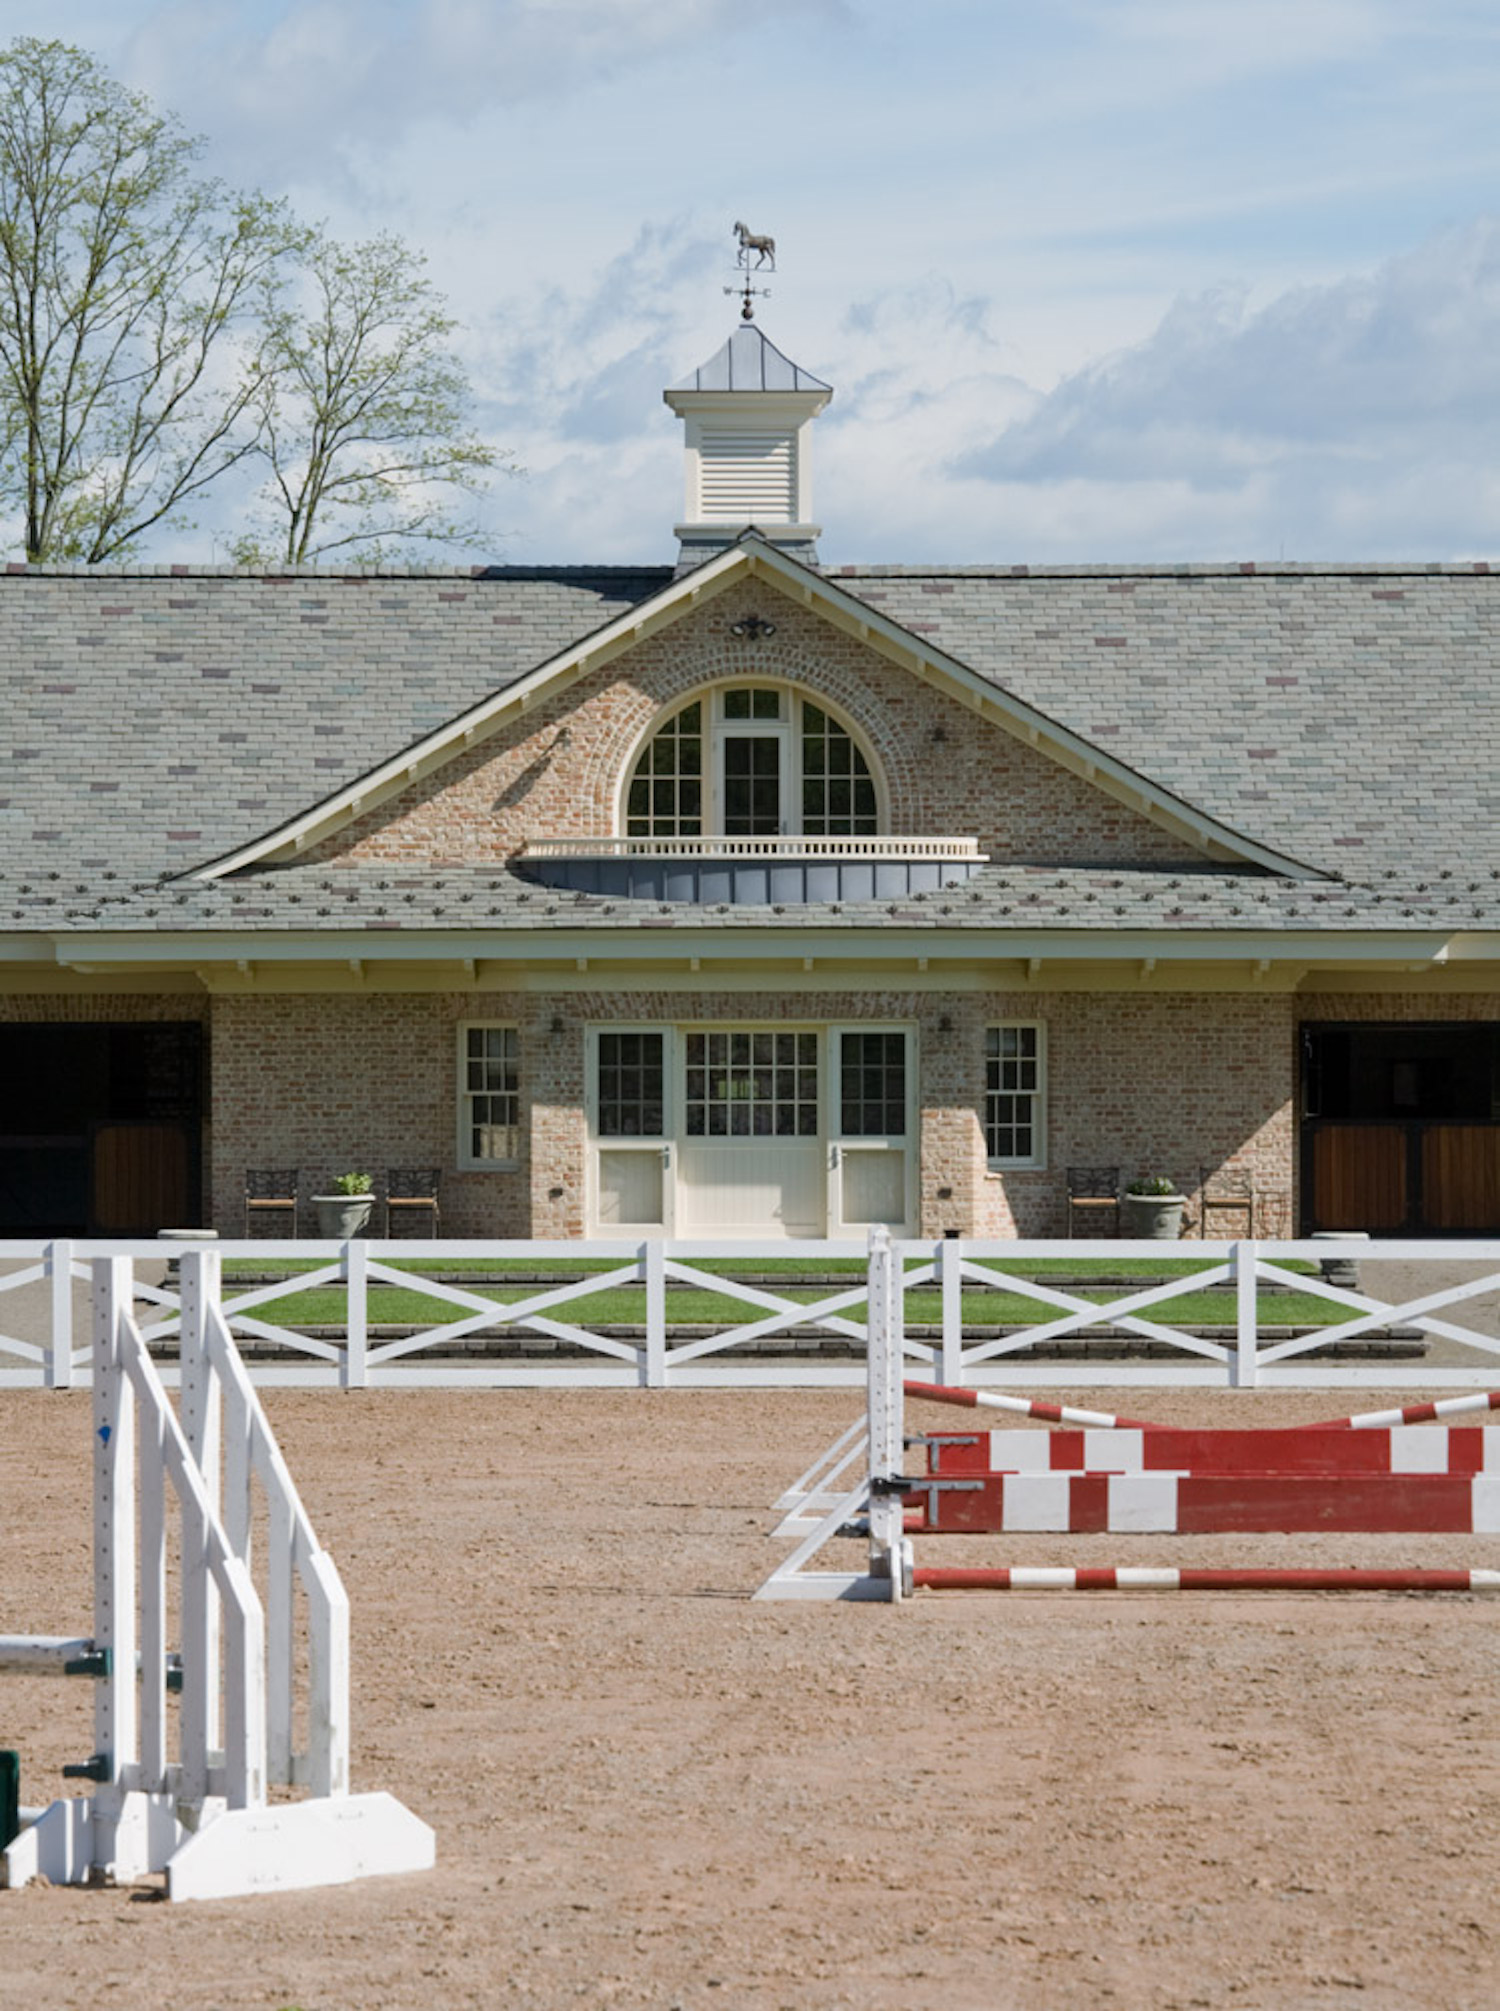 0206_stables2.jpg